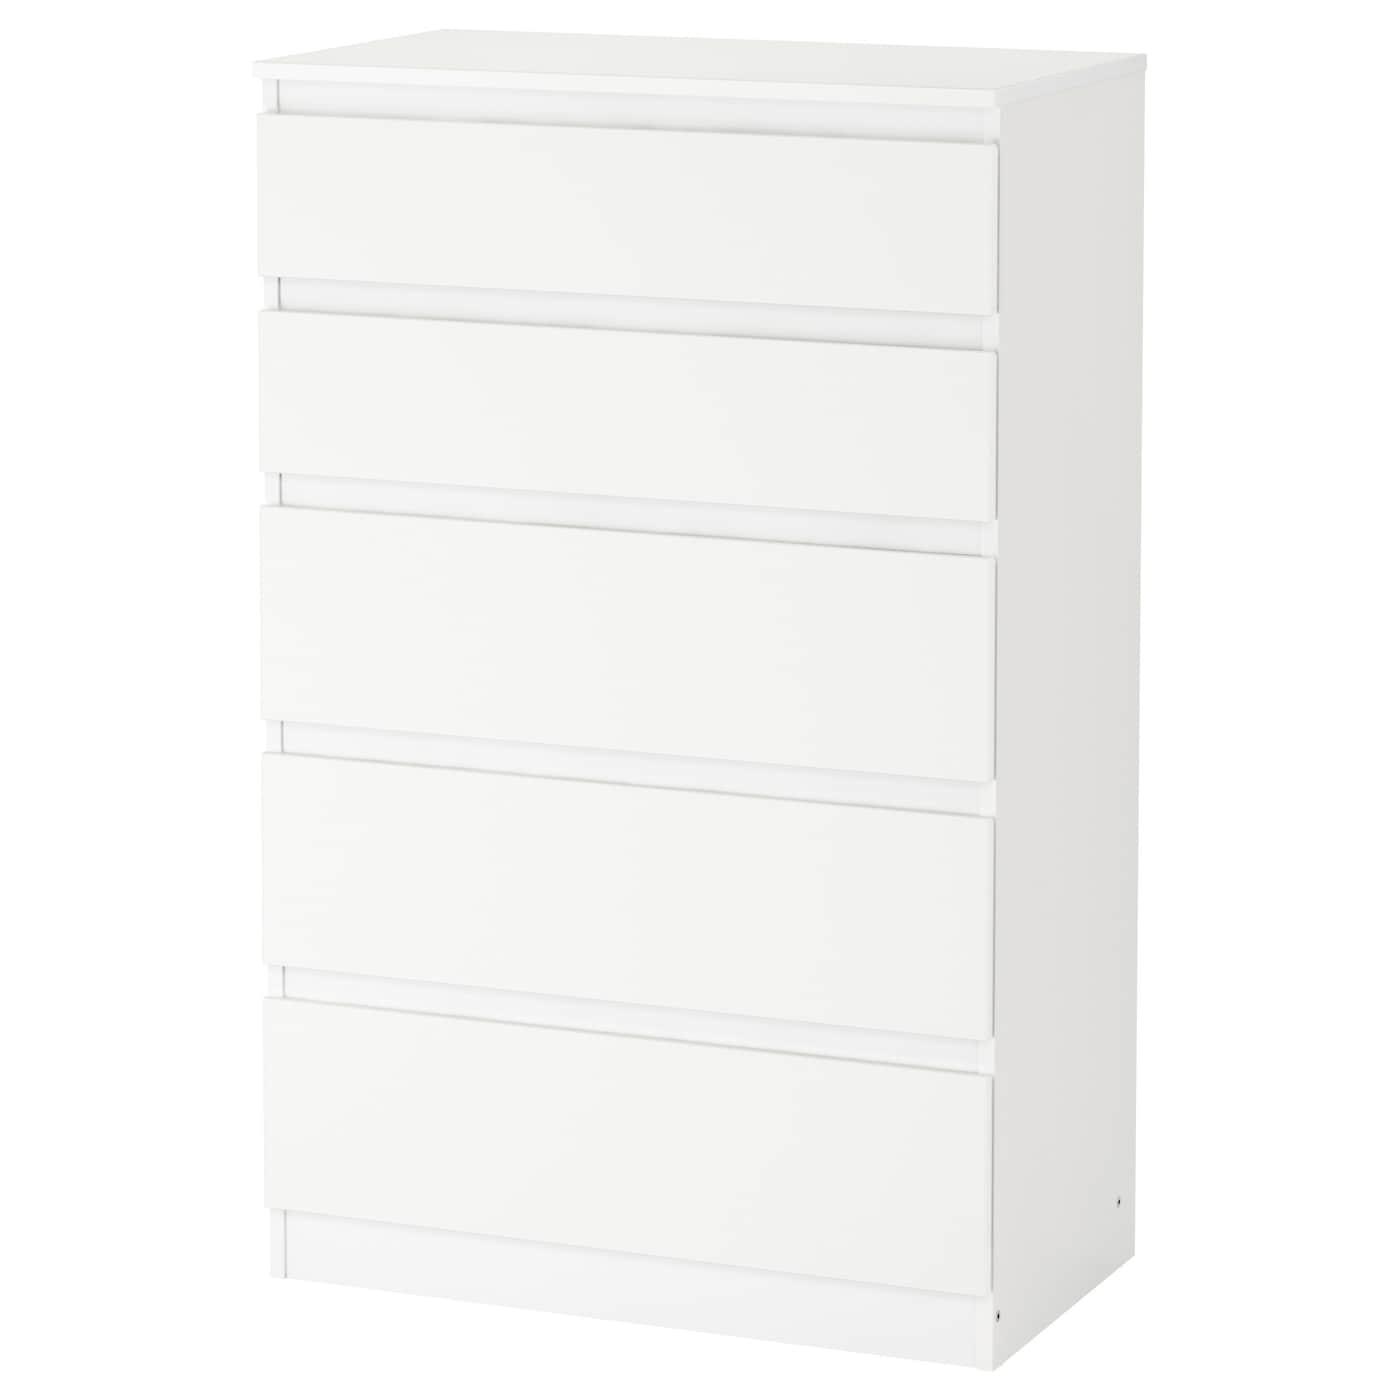 5 tiroirs tiroirs KULLEN 5 blanc Commode blanc Commode KULLEN TK1clFJ